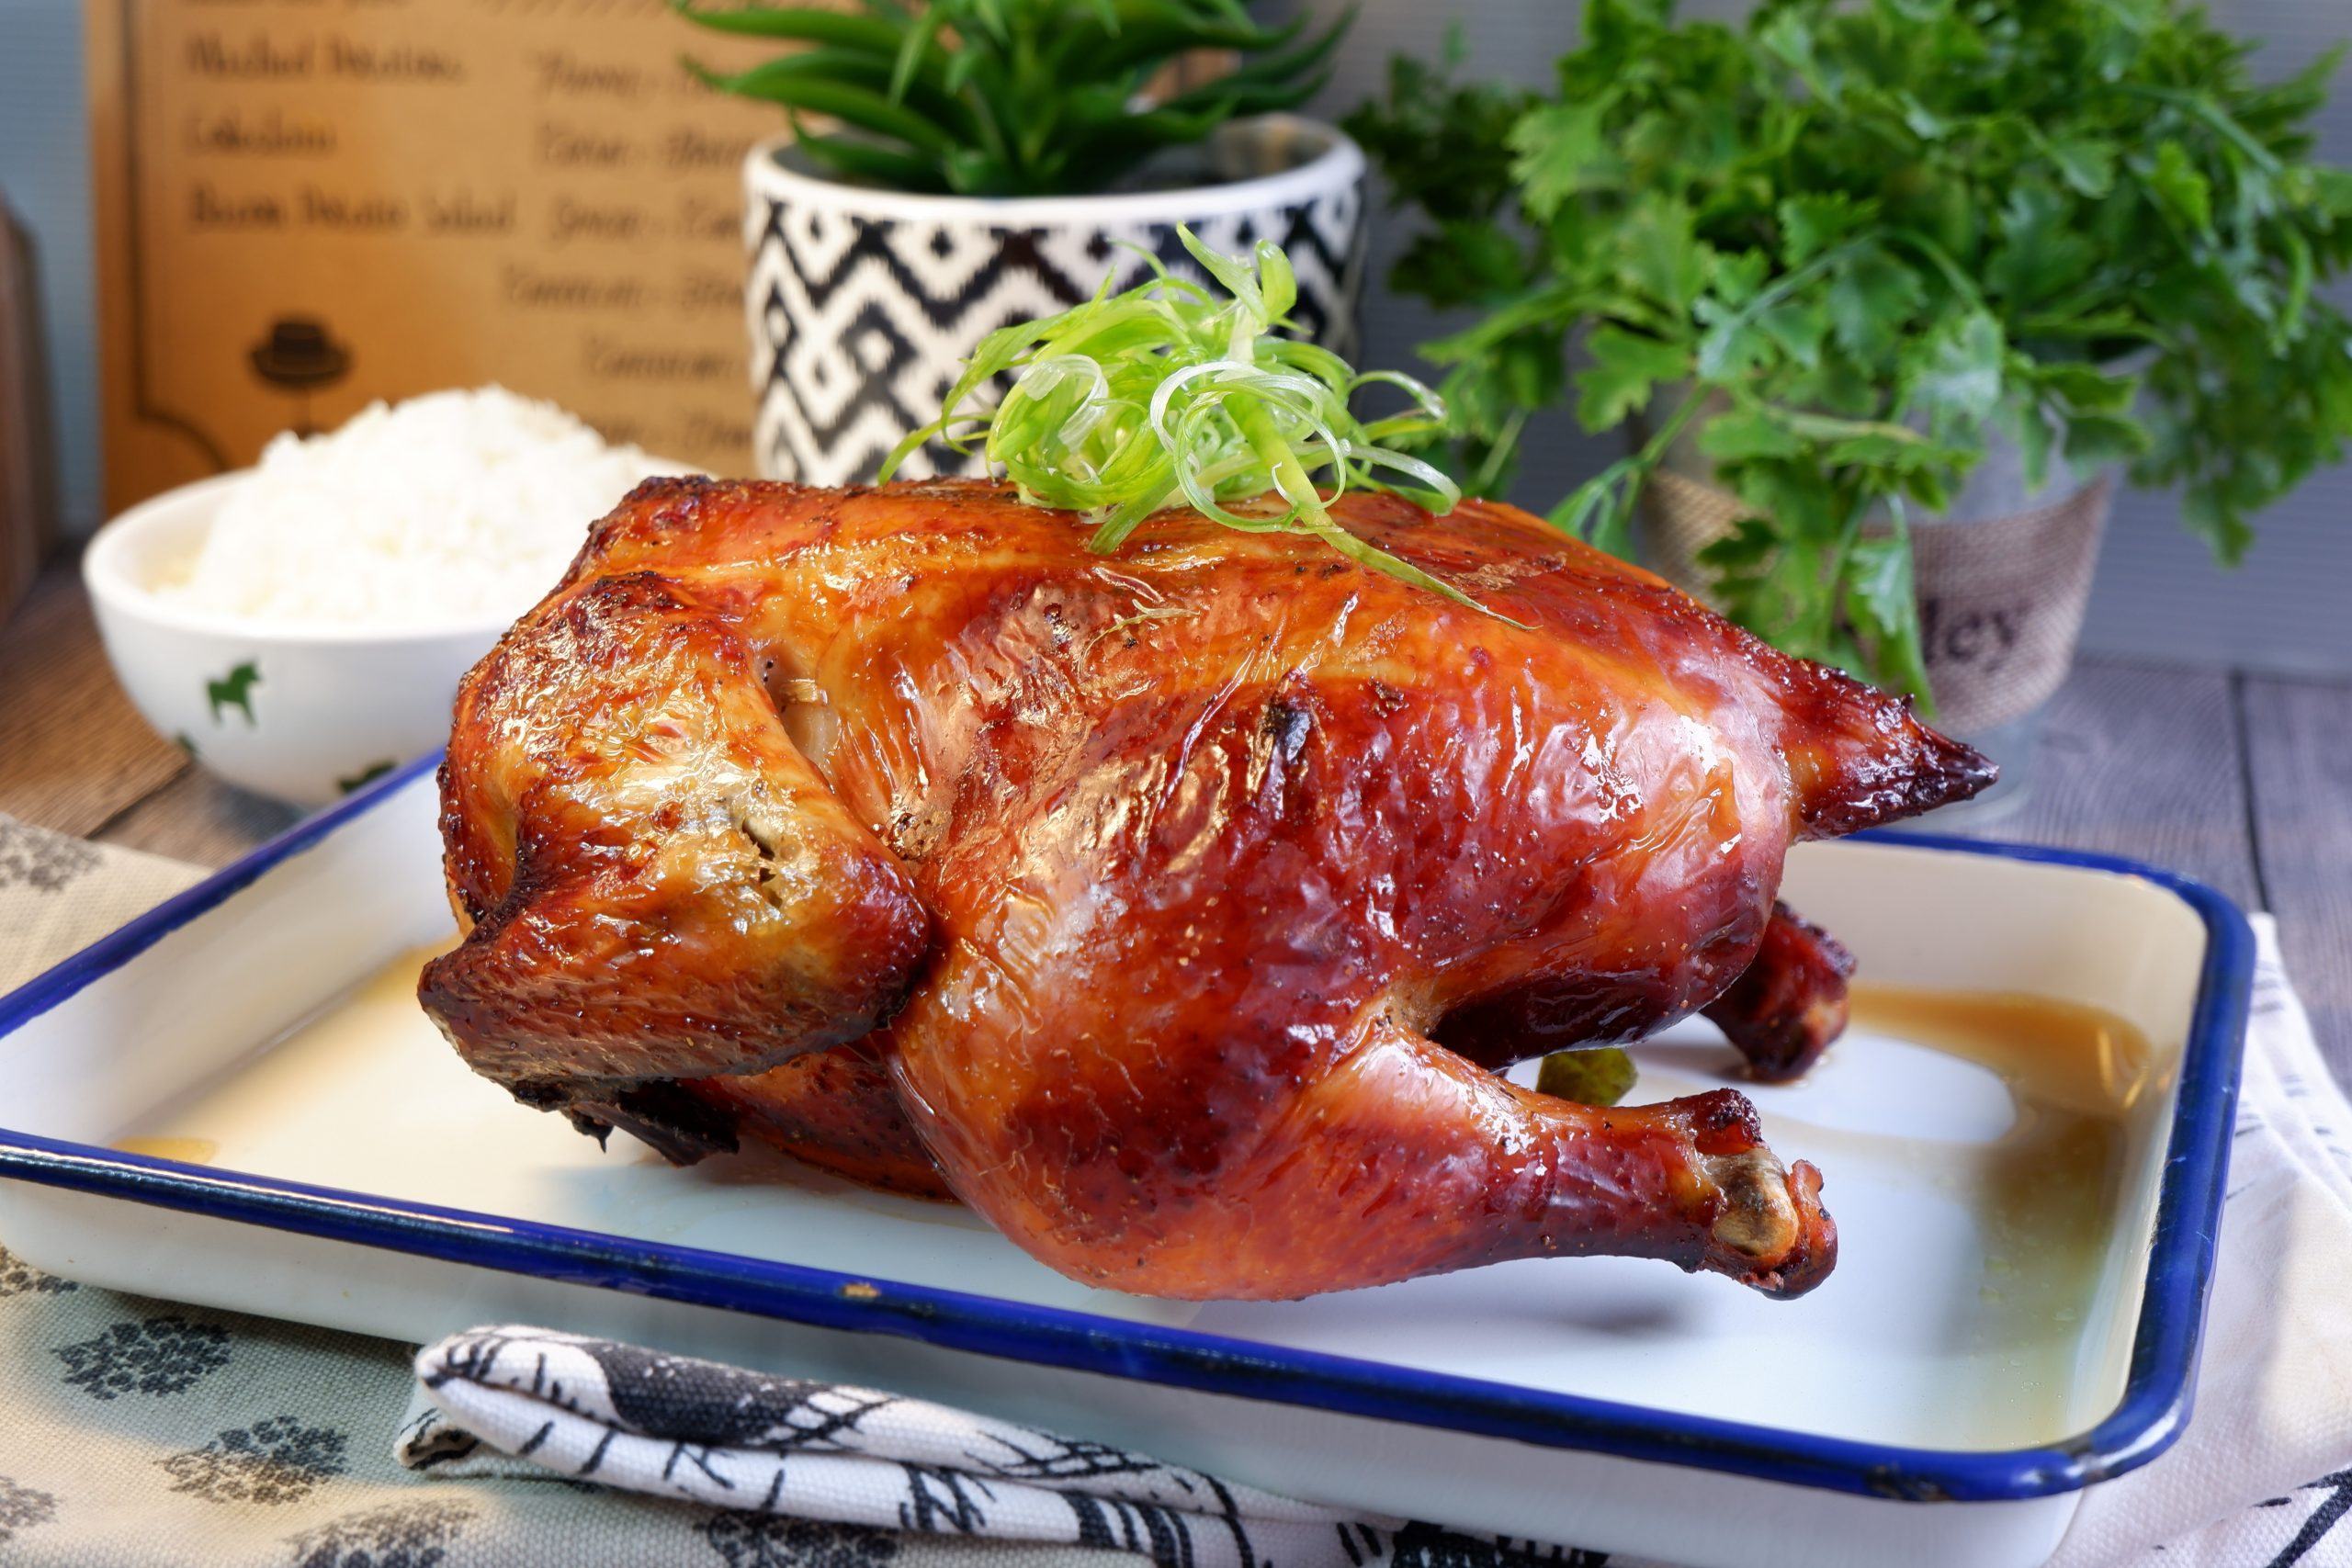 Asian Style Roast Chicken 亚洲烤鸡 Super Easy Oven (Air Fryer) Chicken Recipe